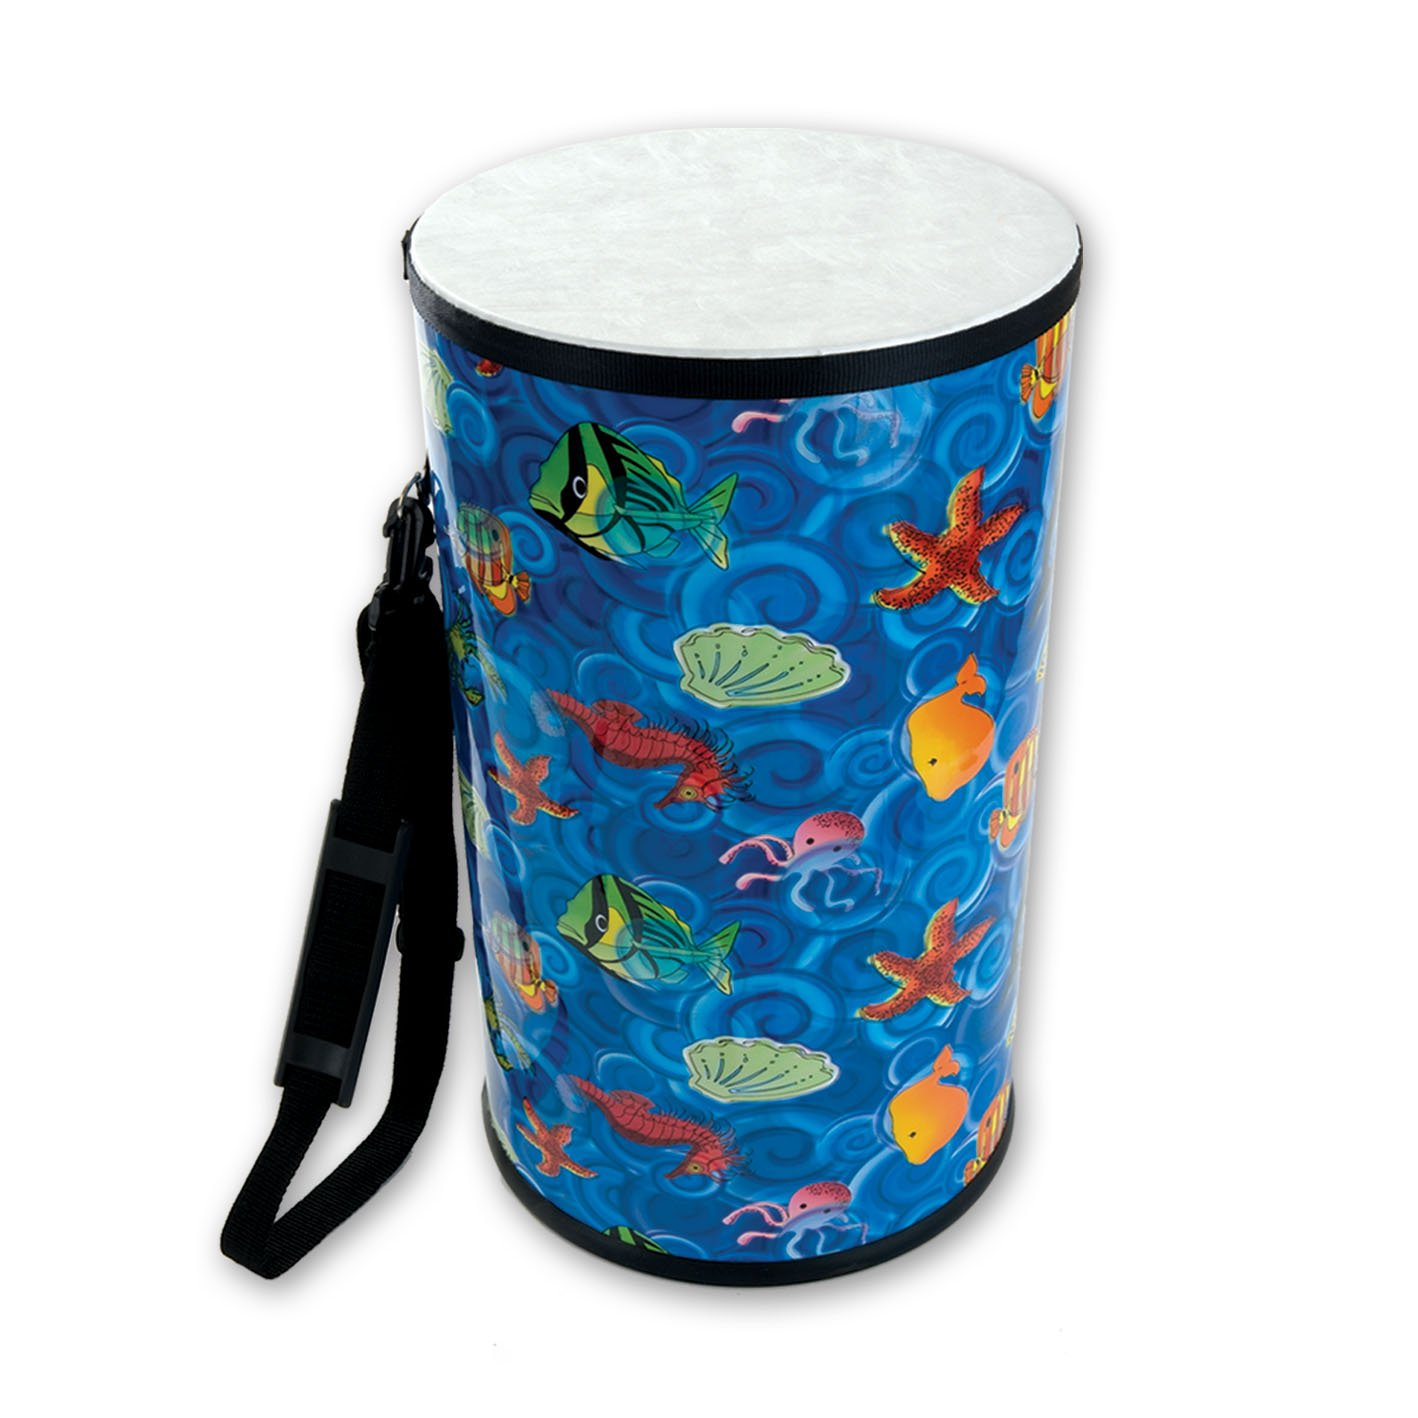 Percussion Plus Tubano Ocean Fish